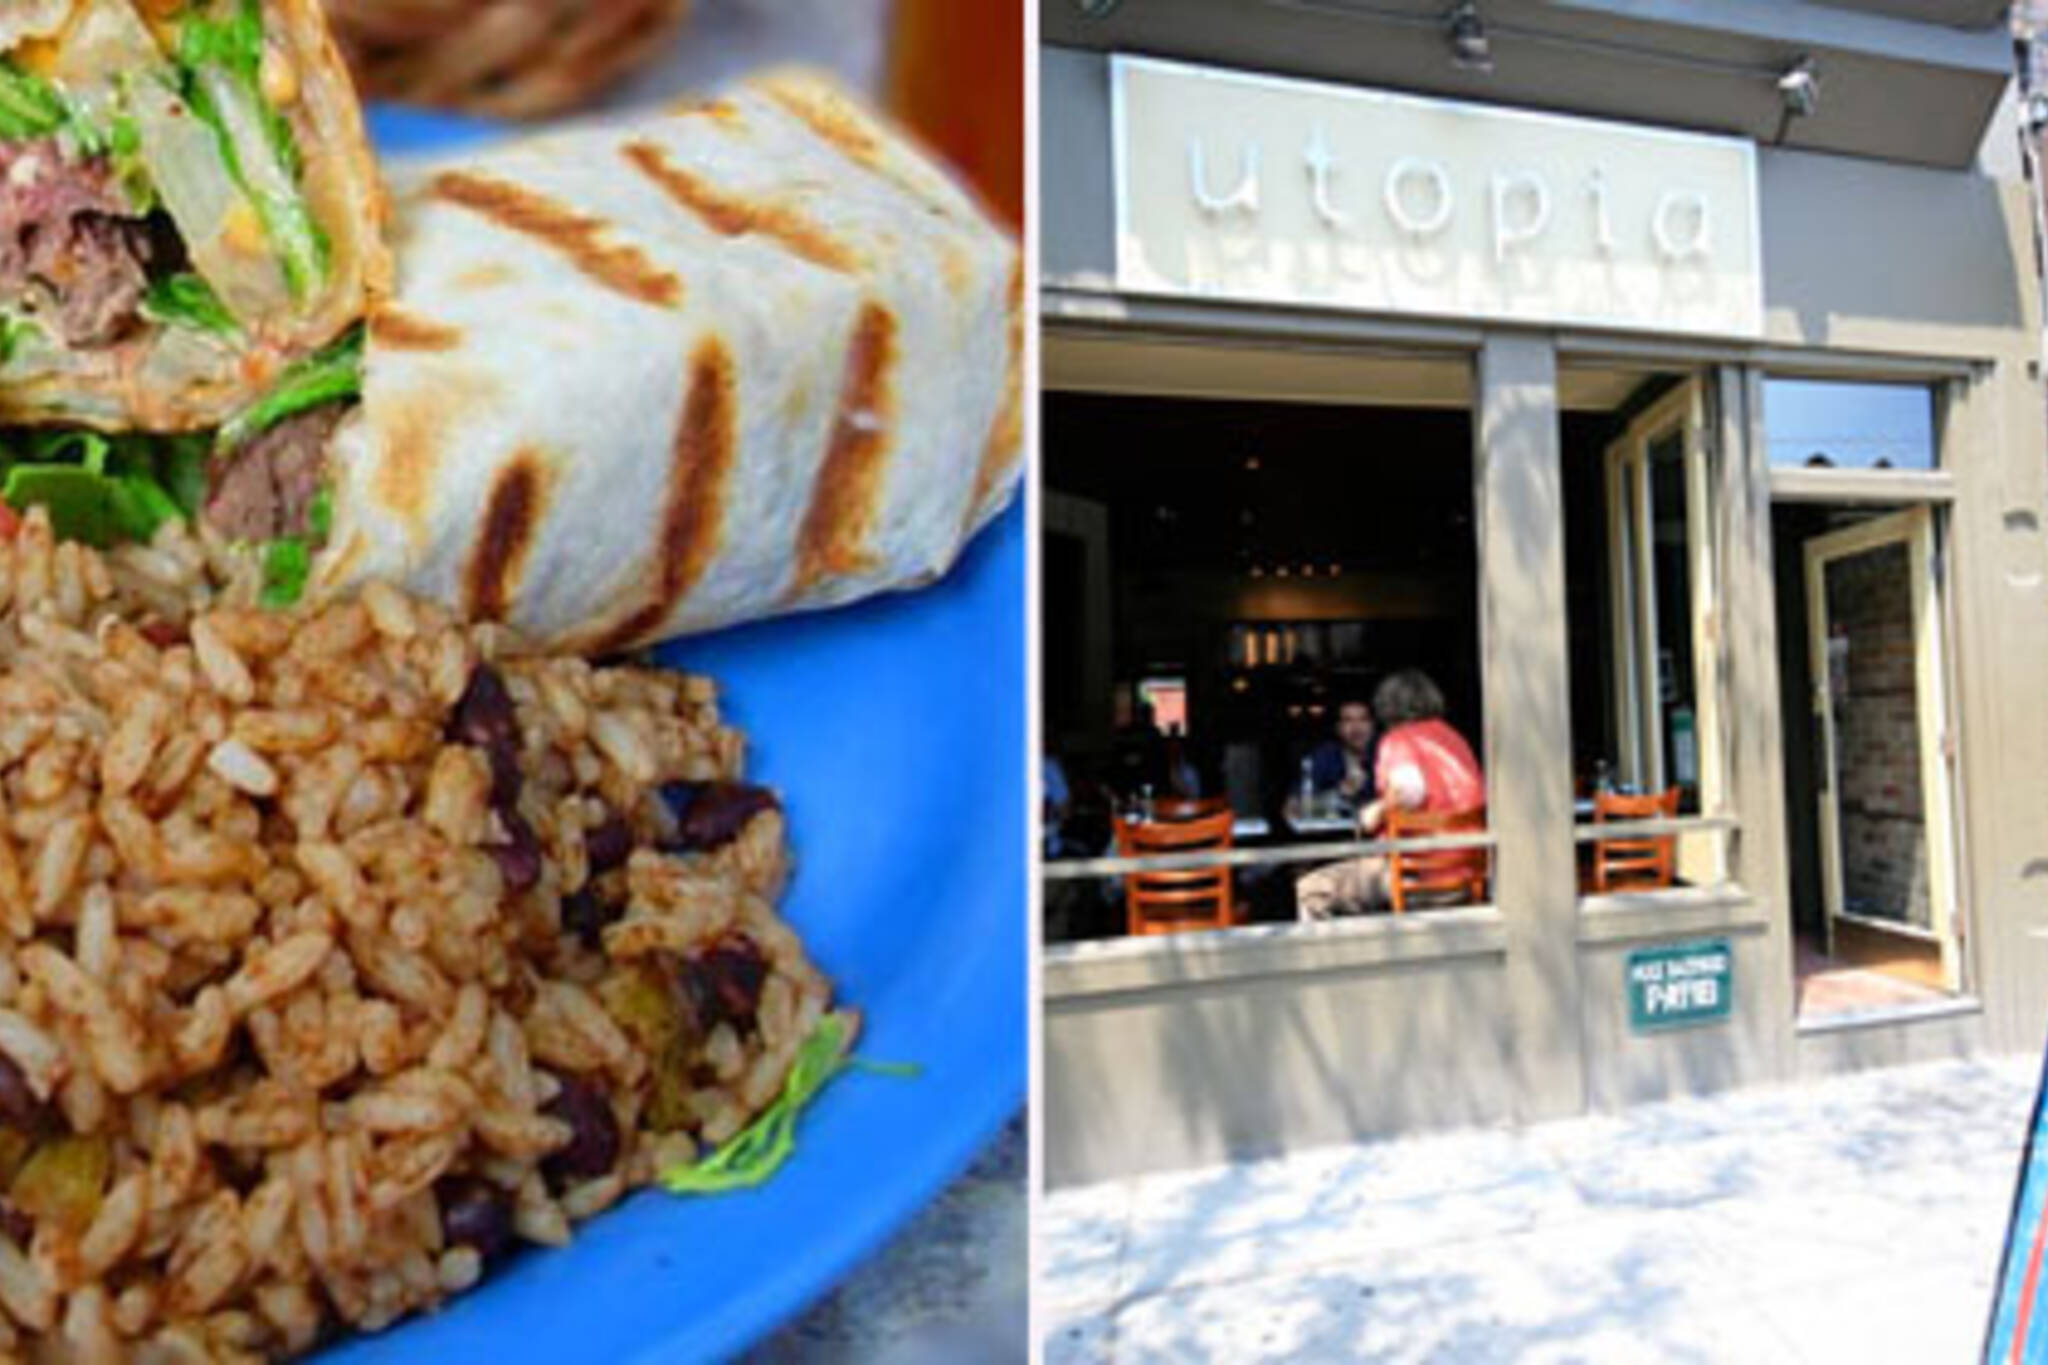 Utopia Cafe Burrito